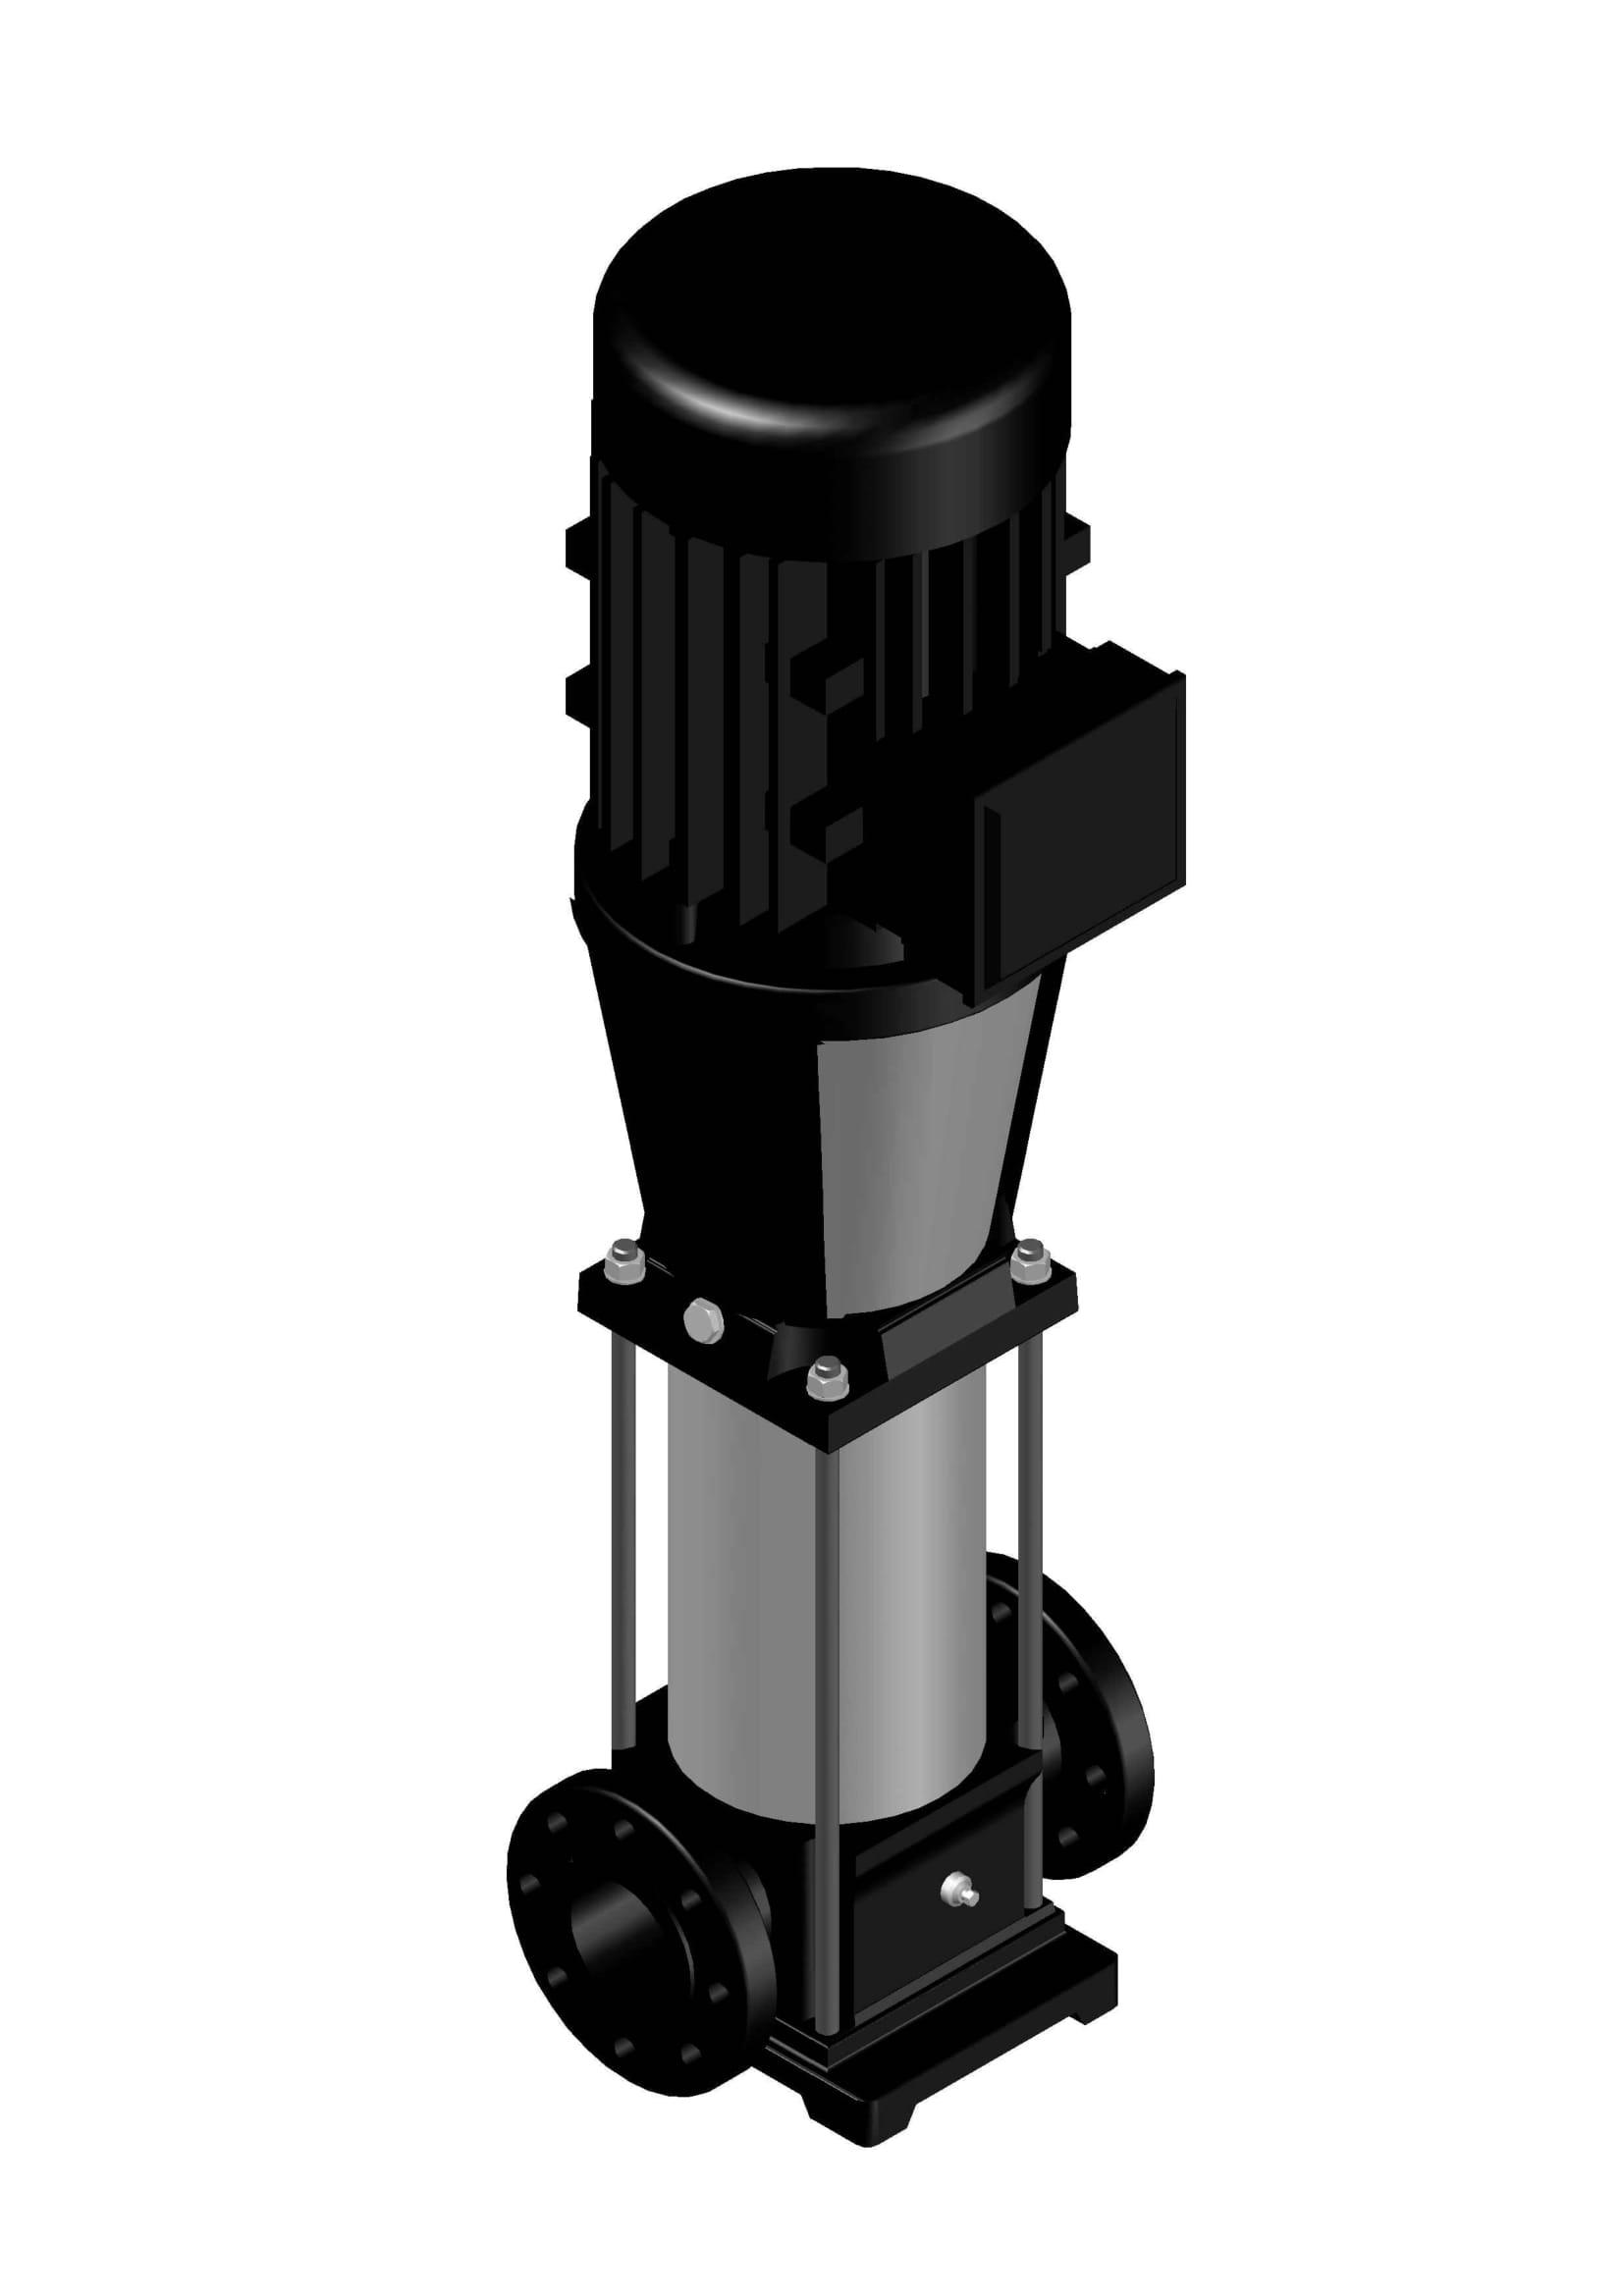 BV 64-03-01